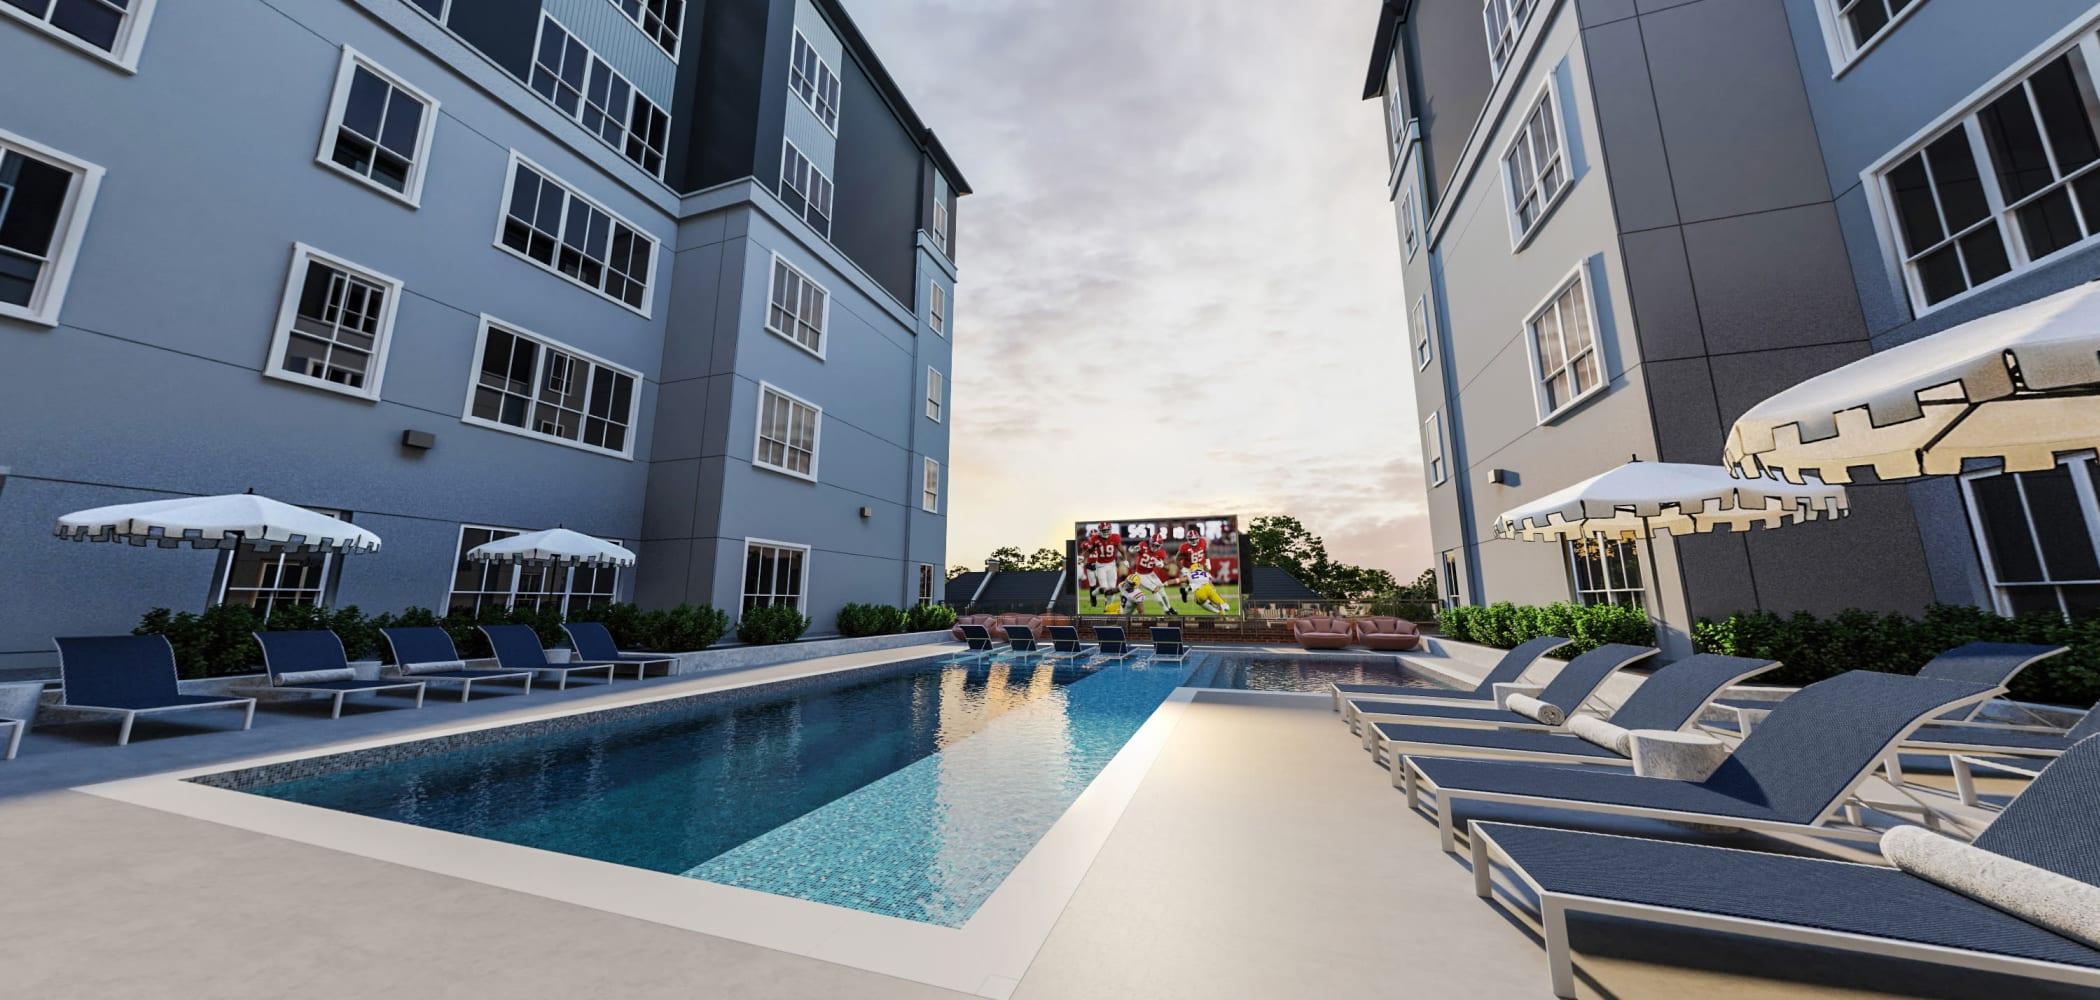 Resort-style swimming pool at HERE Tuscaloosa in Tuscaloosa, Alabama near University of Alabama